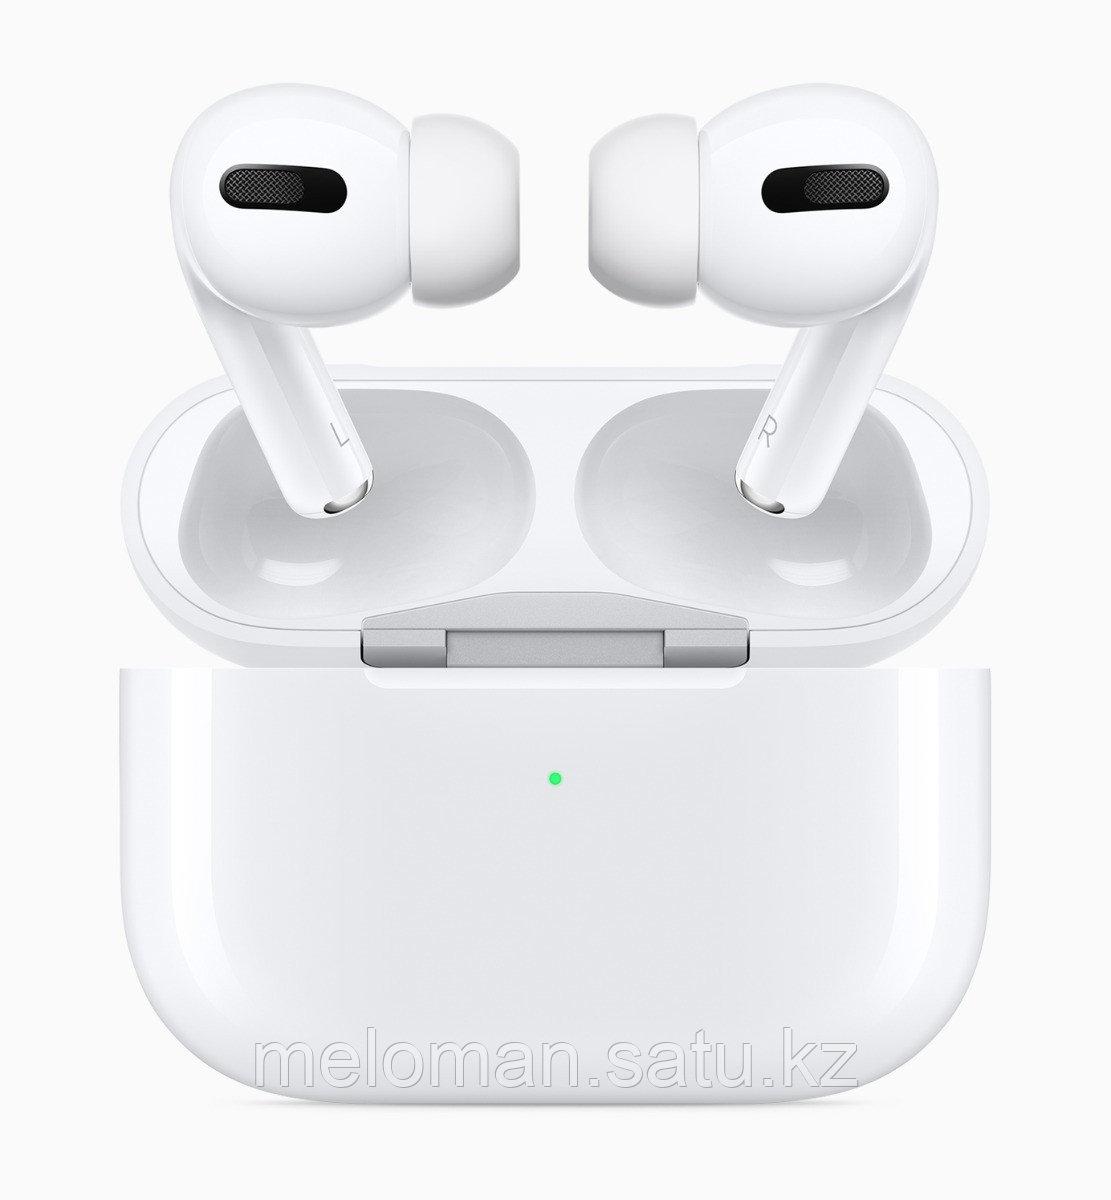 Беспроводные наушники Apple AirPods PRO wireless charging case - фото 2